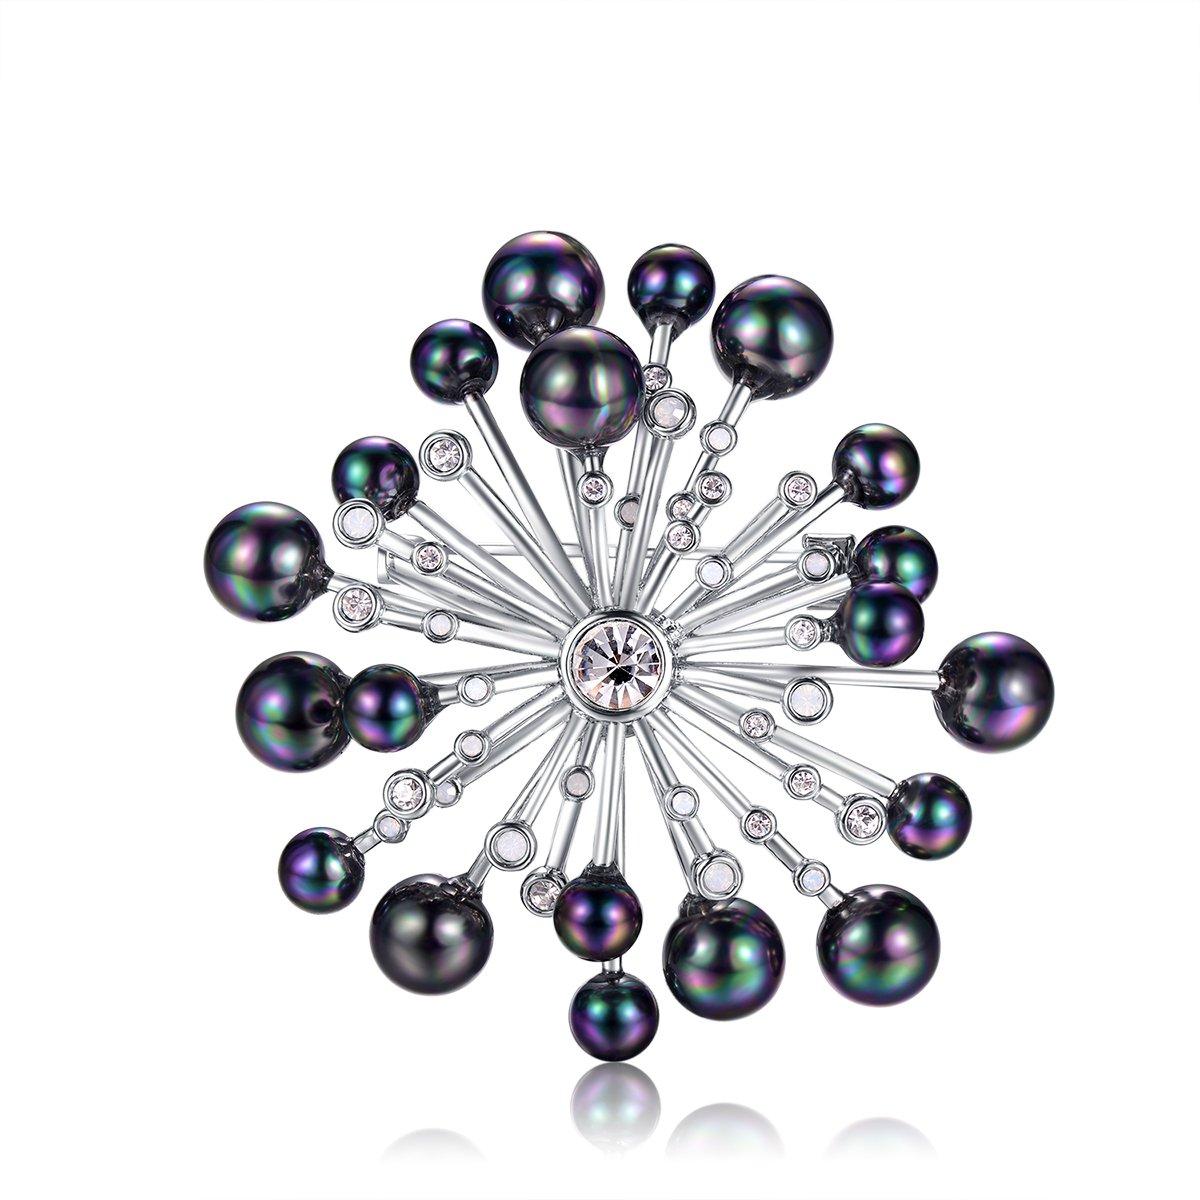 YOUWANG Women's Crystal Colorful Gray Simulated Pearl Elegant Brooch Pin Silver-Tone